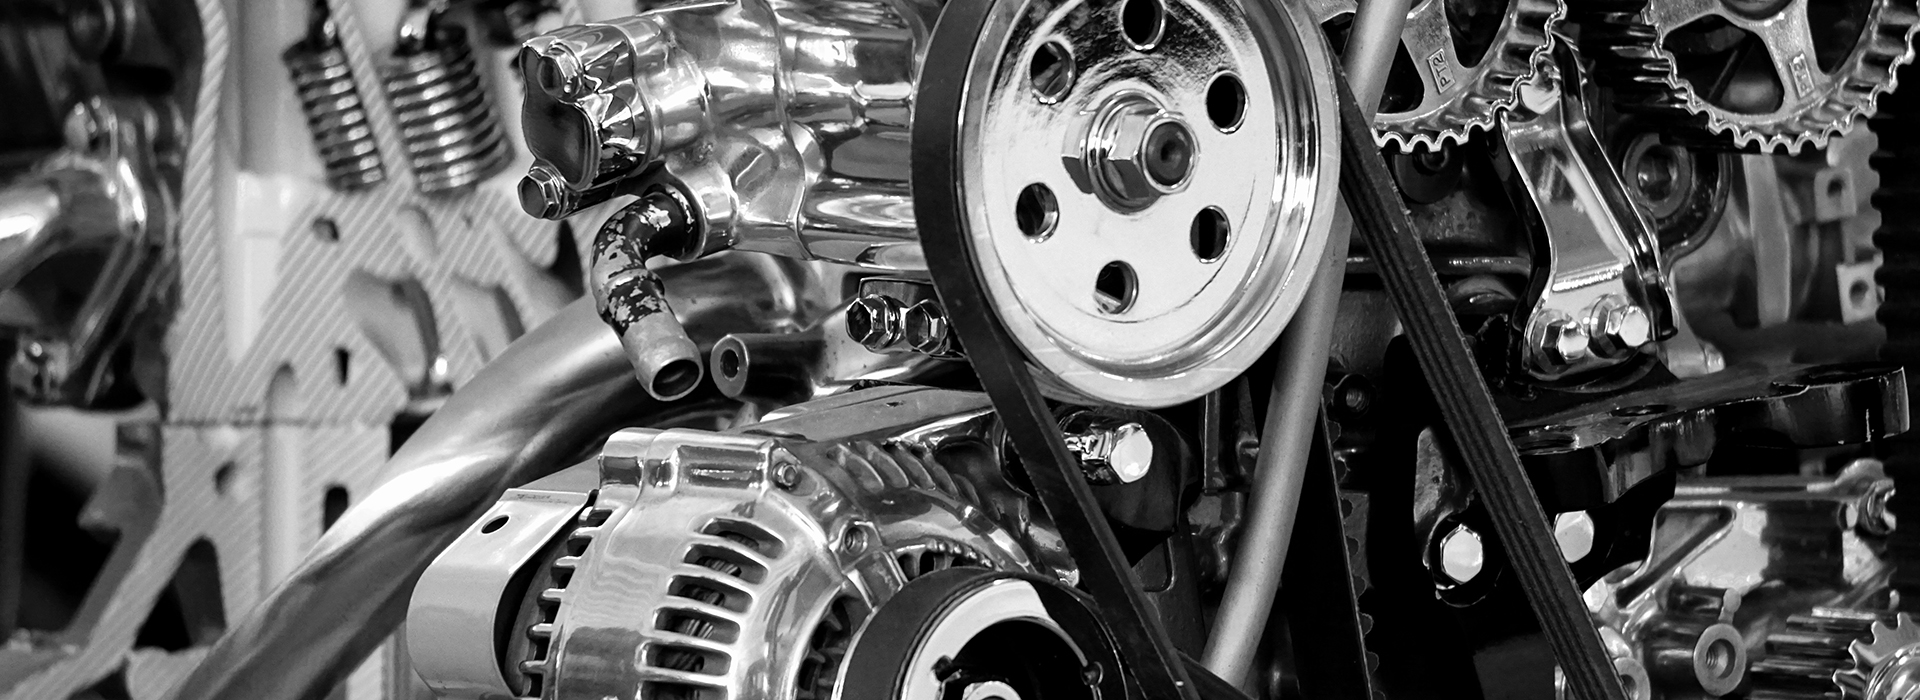 Sterowniki silnika